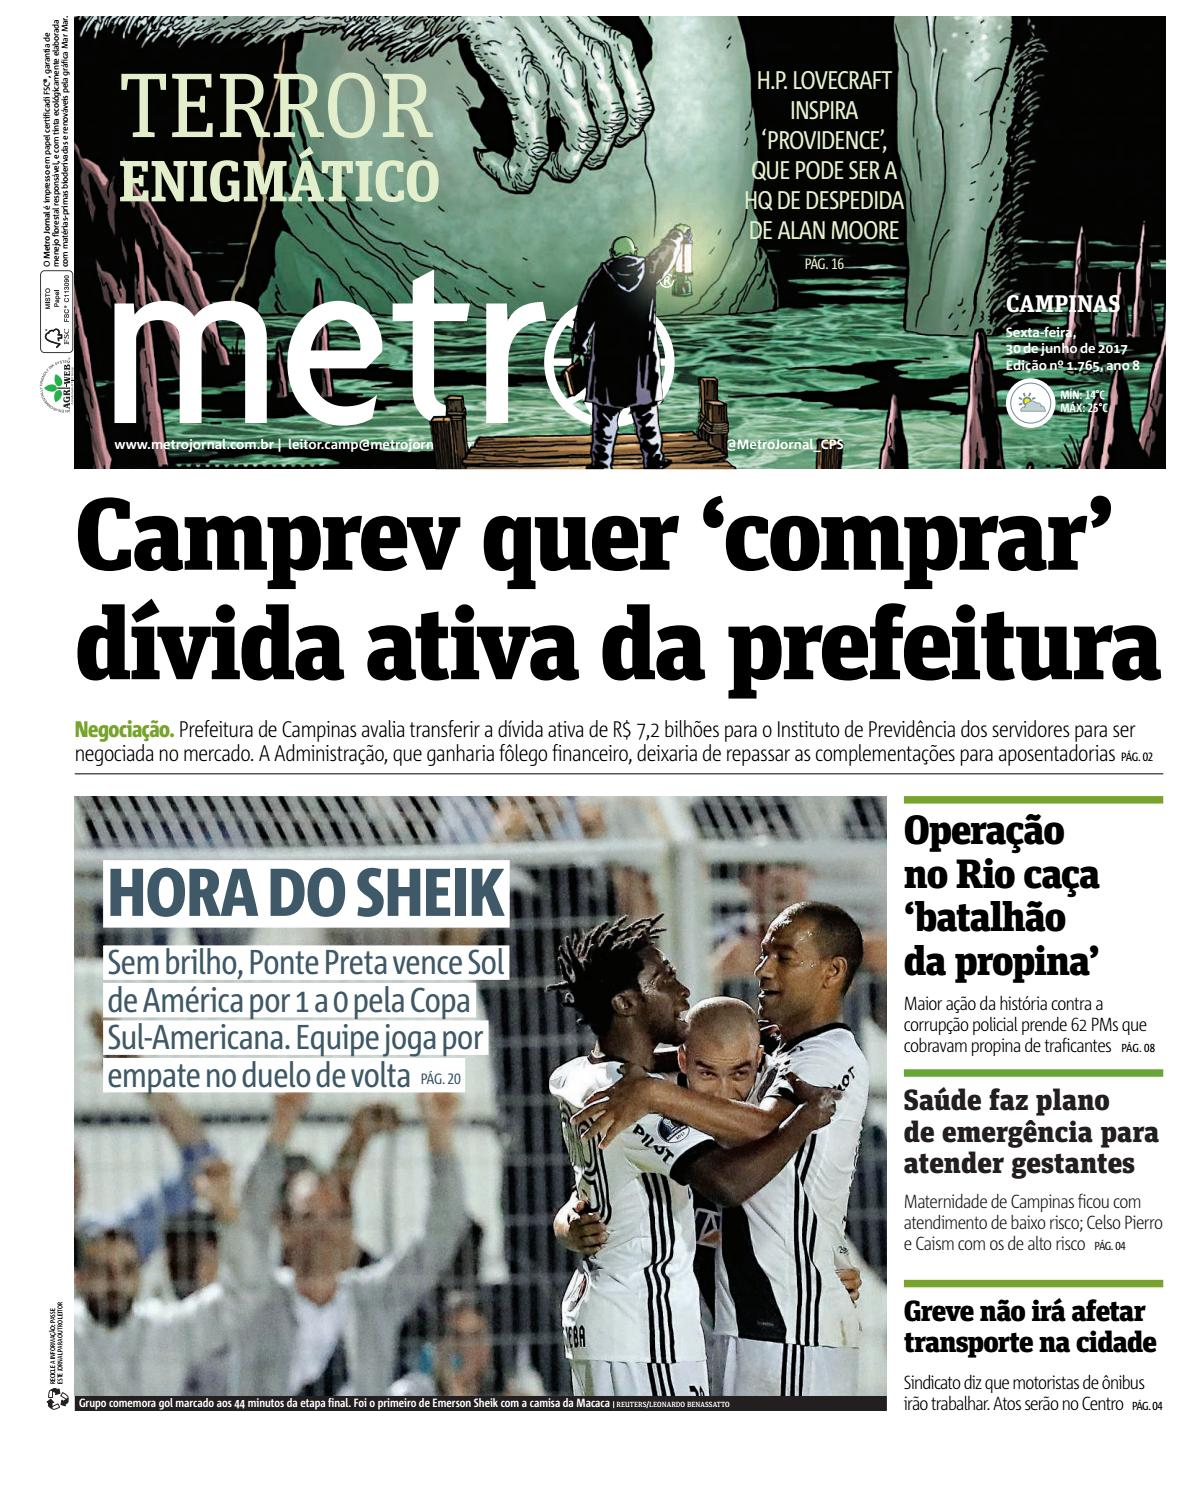 8bbe1a46957e5 Campinas 30 06 2017 by metro brazil - issuu